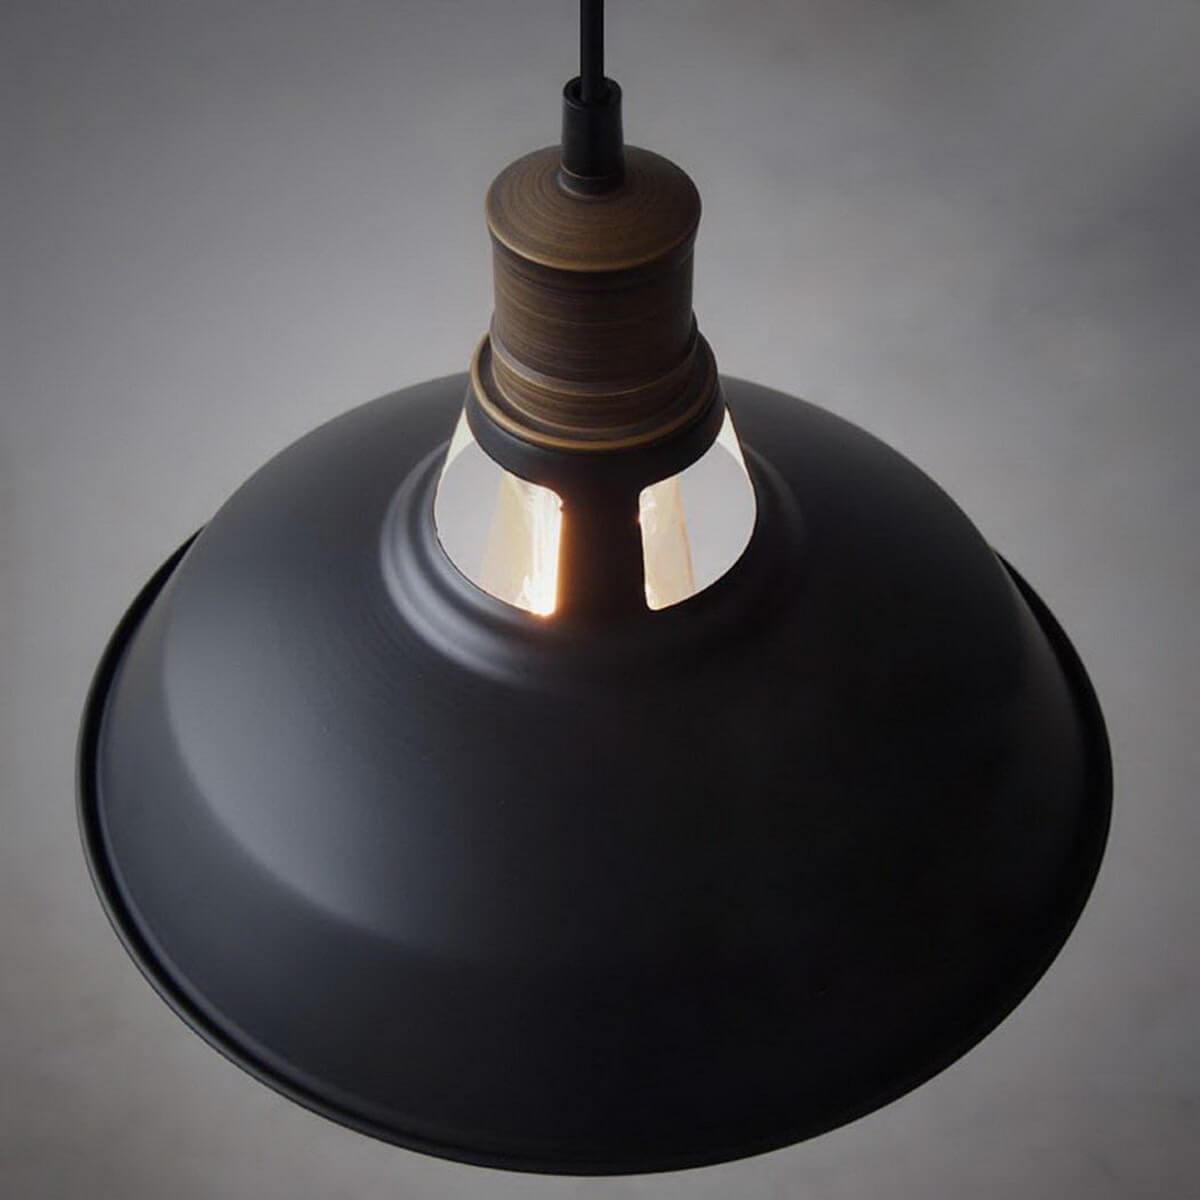 Industrial Black Barn Pendant Loft Light Fixture 3 Pack